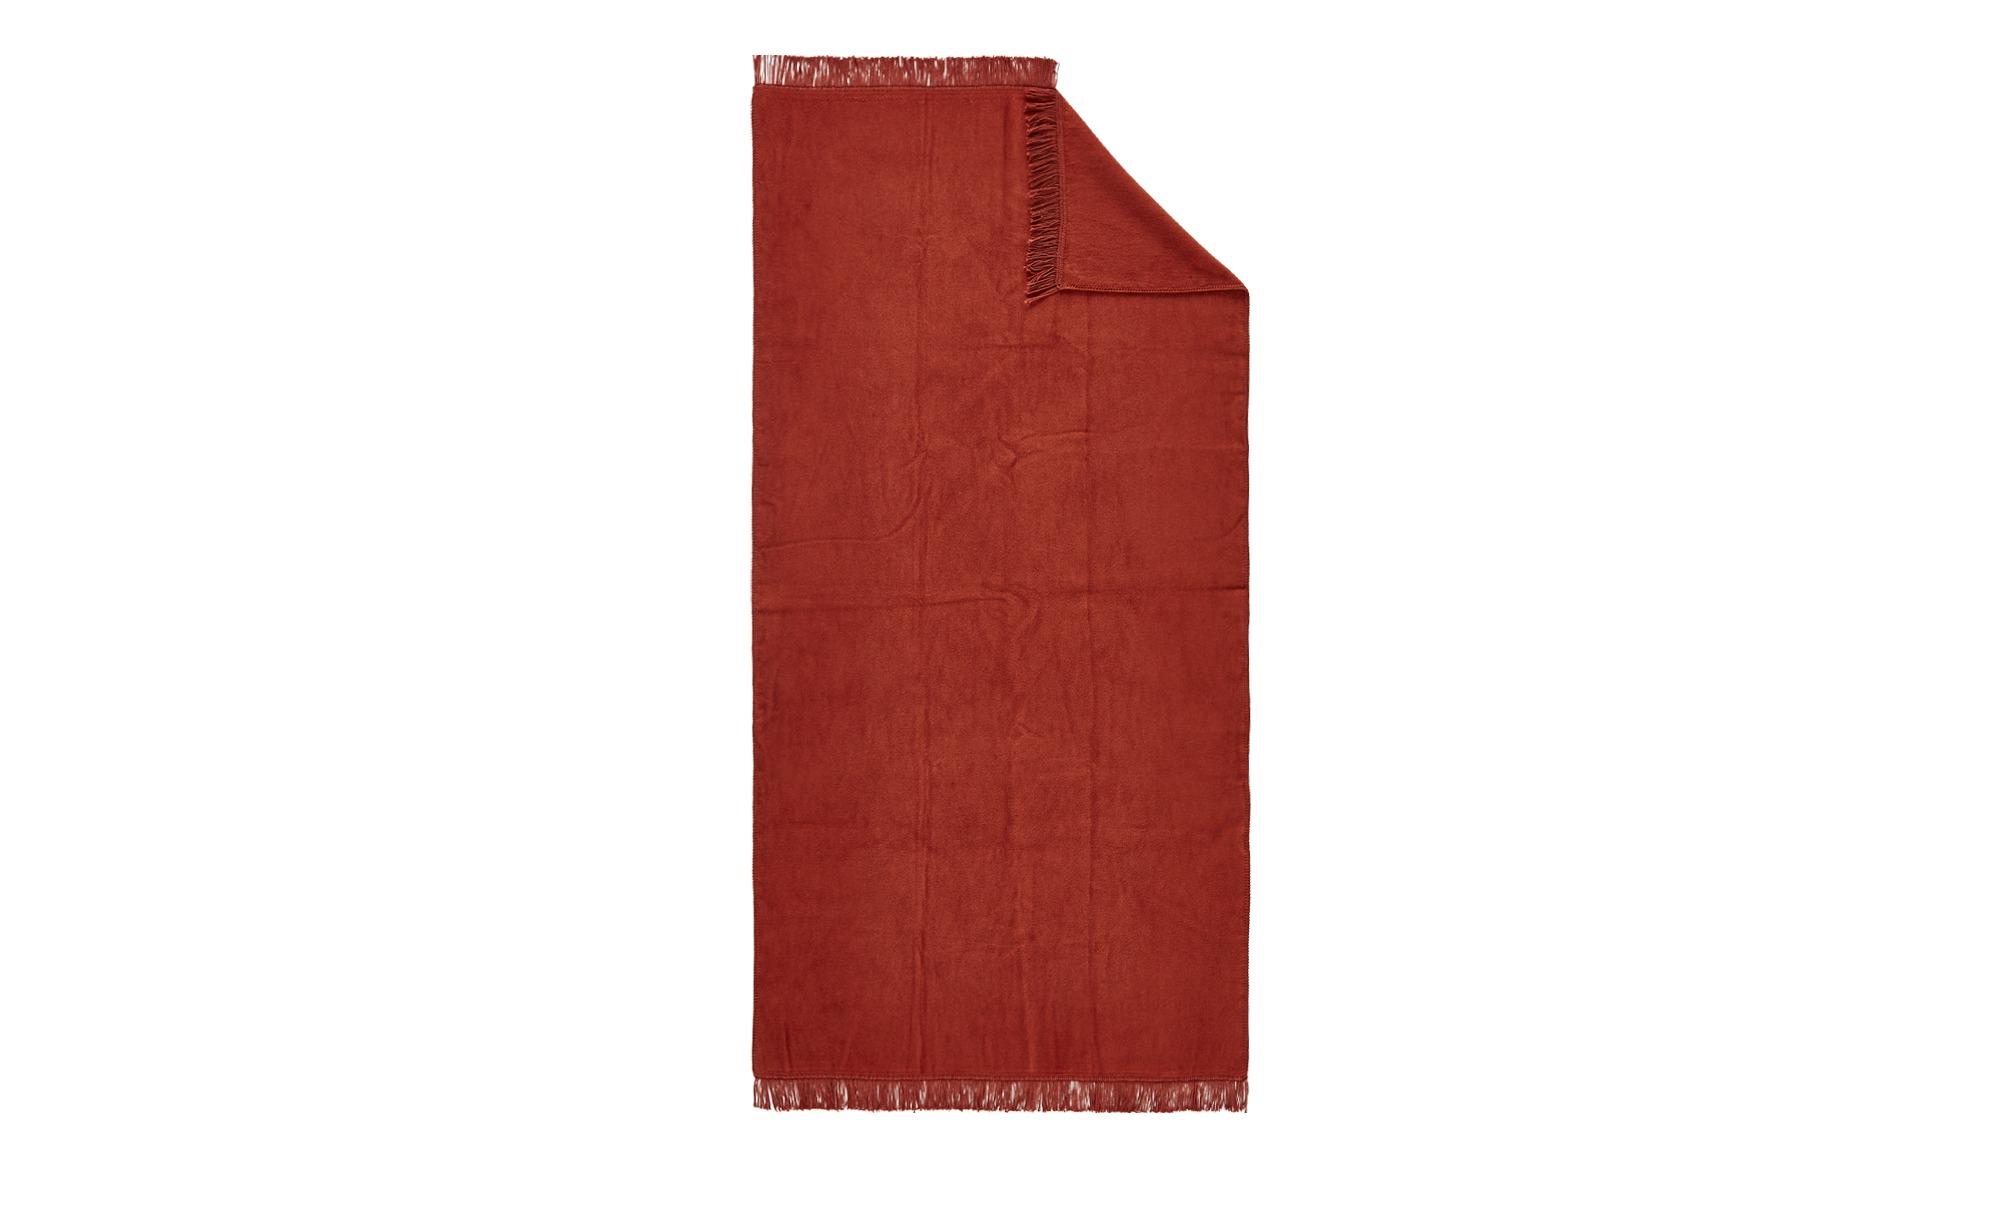 LAVIDA Sofaläufer  Uni ¦ rot ¦ 60% Baumwolle, 40% Polyacryl  ¦ Maße (cm): B: 100 Bettwaren > Tagesdecken & Bettüberwürfe - Höffner